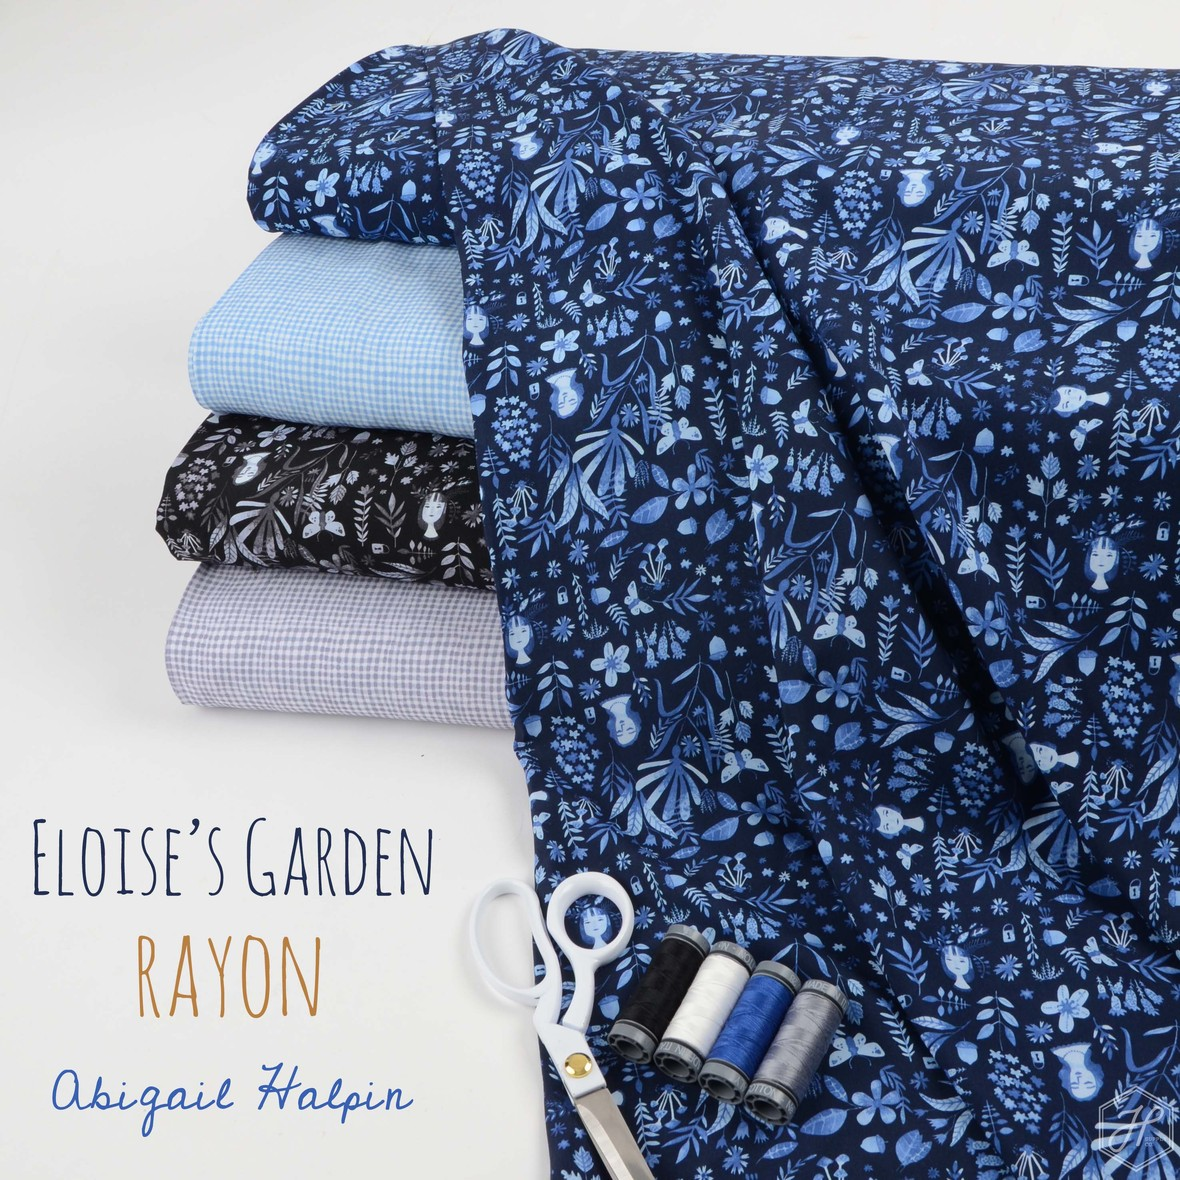 Eloises Garden Rayon Figo fabric at Hawthorne